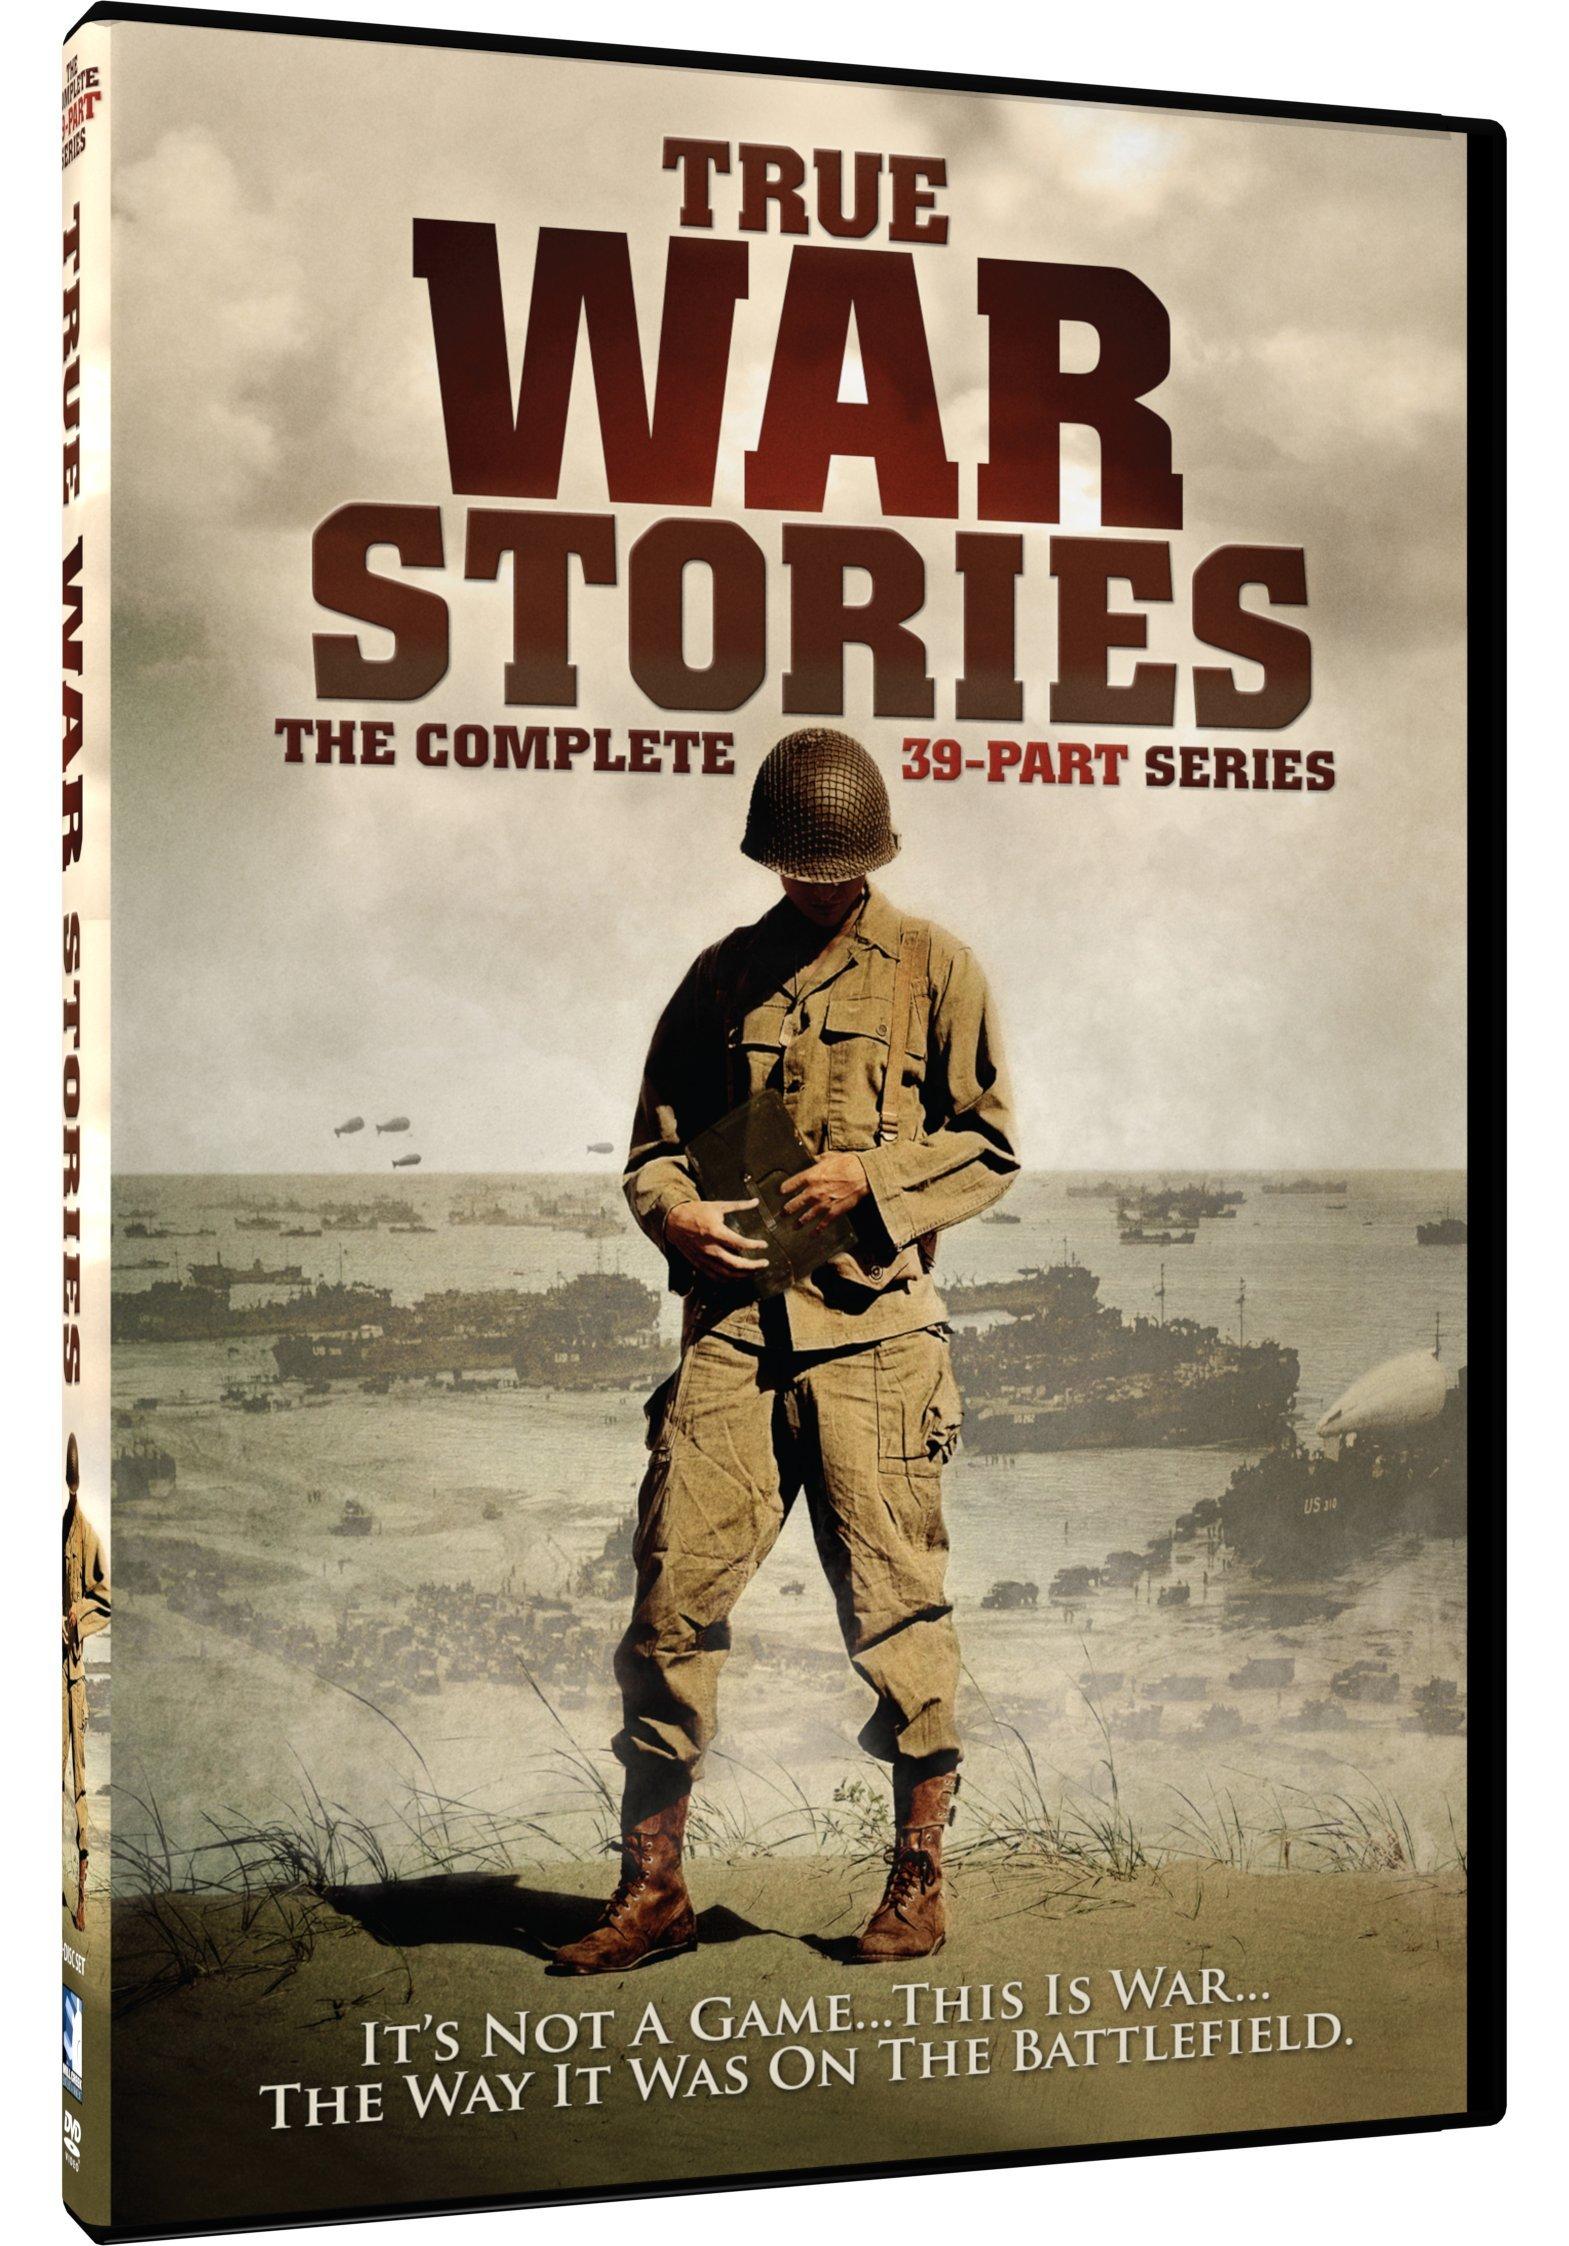 True War Stories: The Complete 39-Part Series